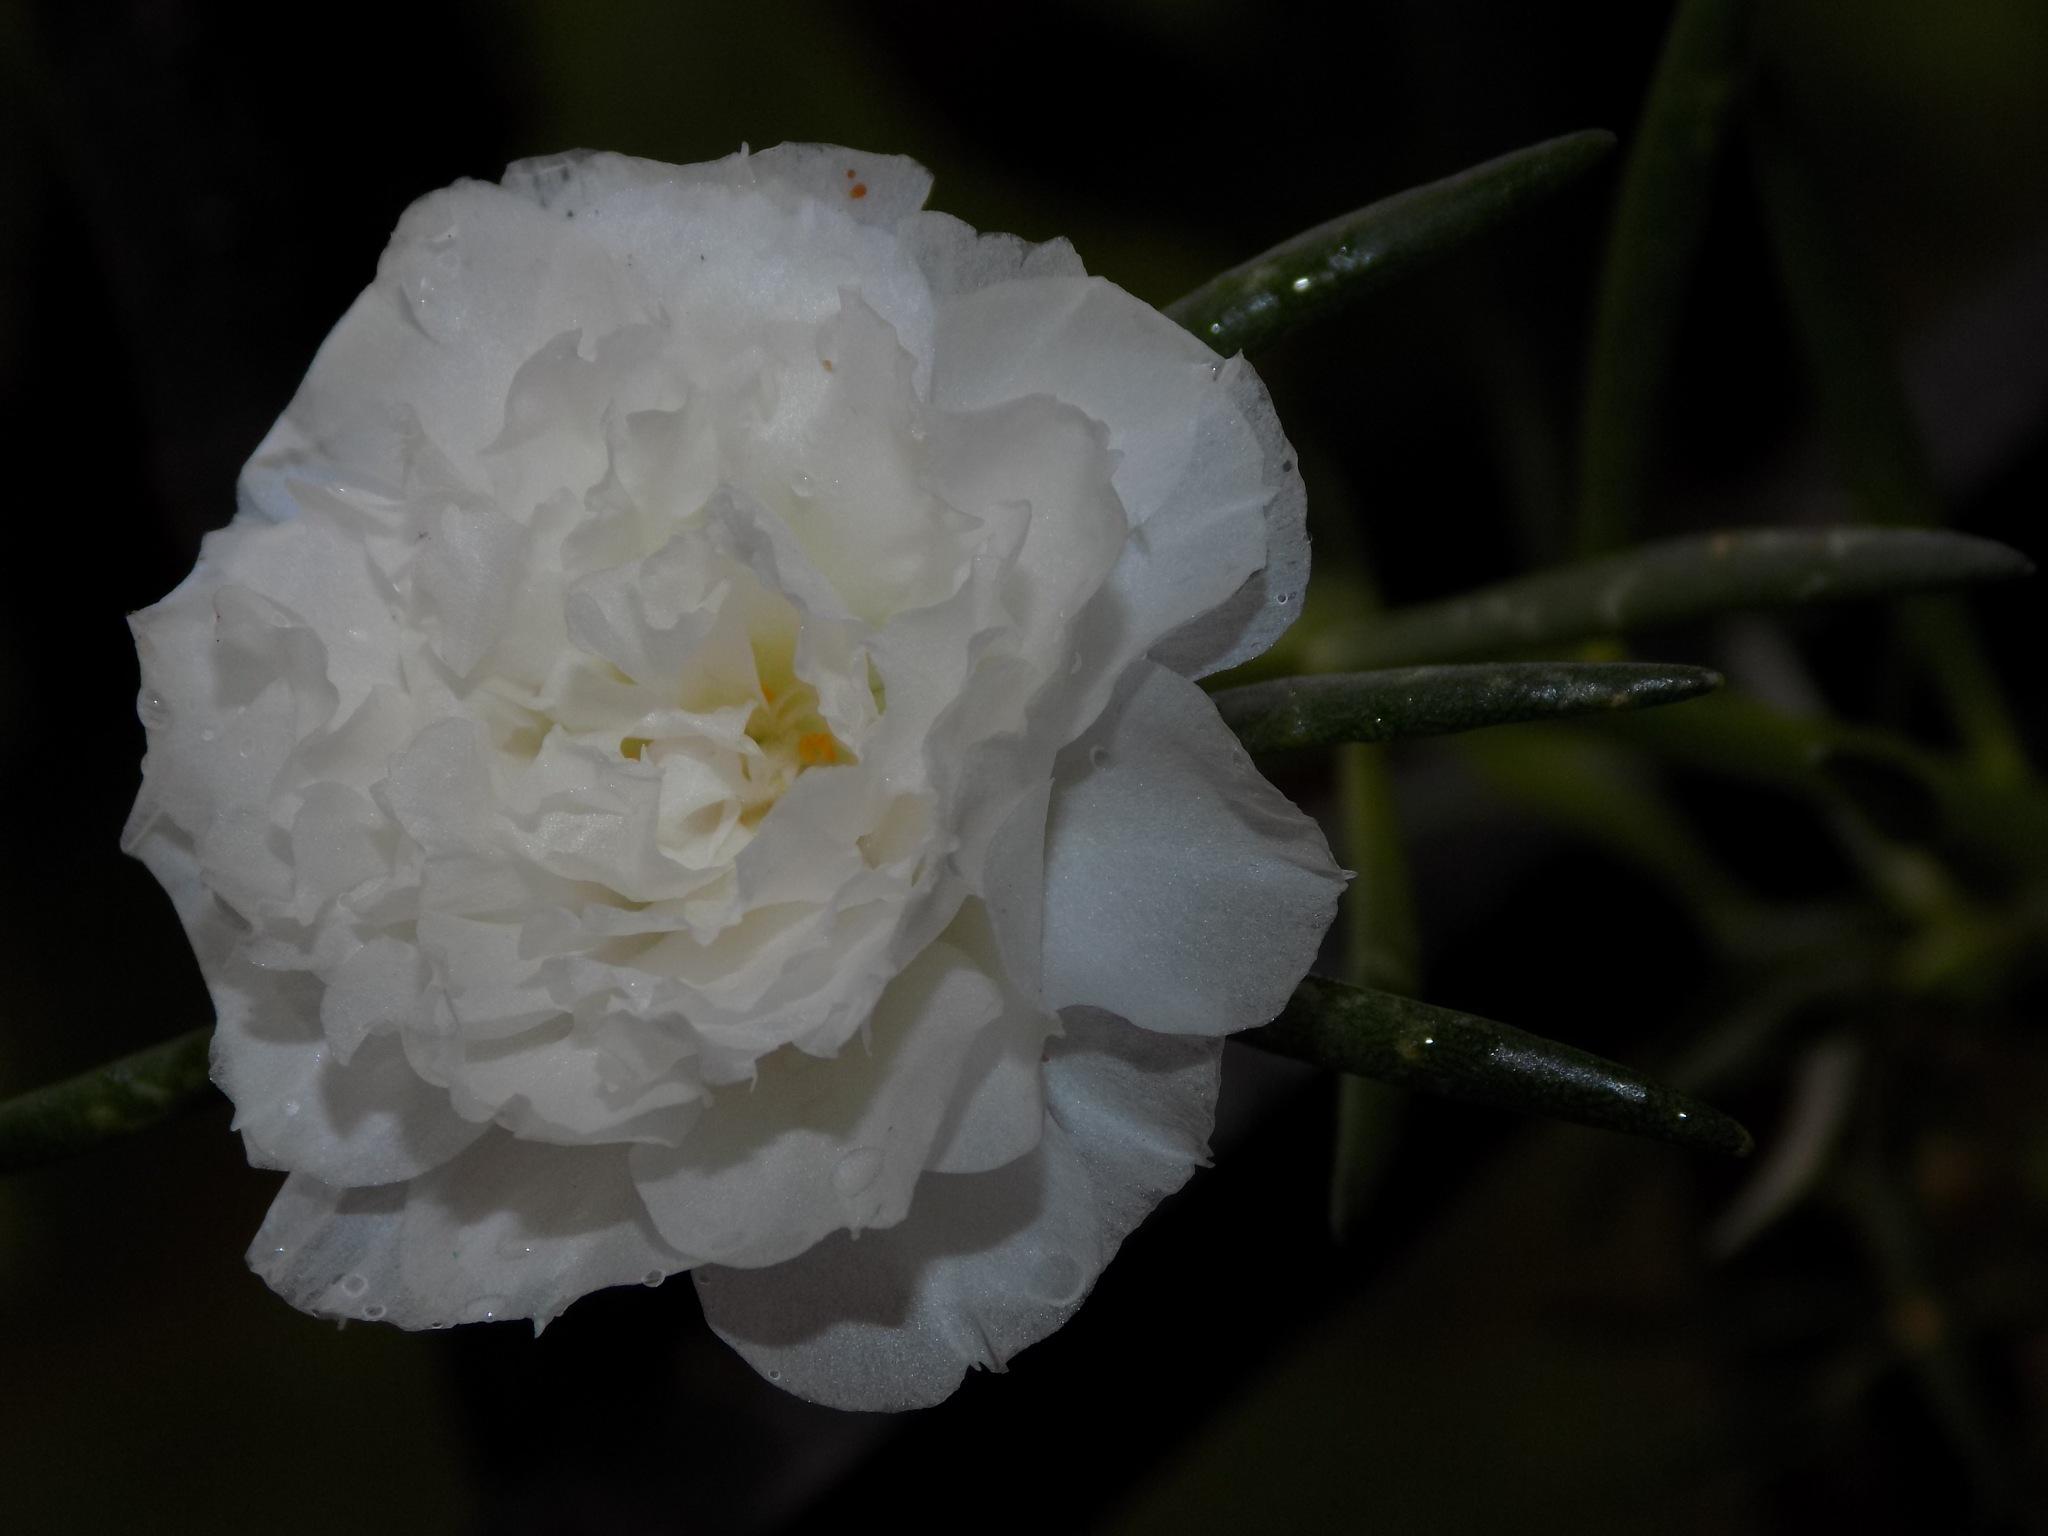 White flower by Chandramoulieswar